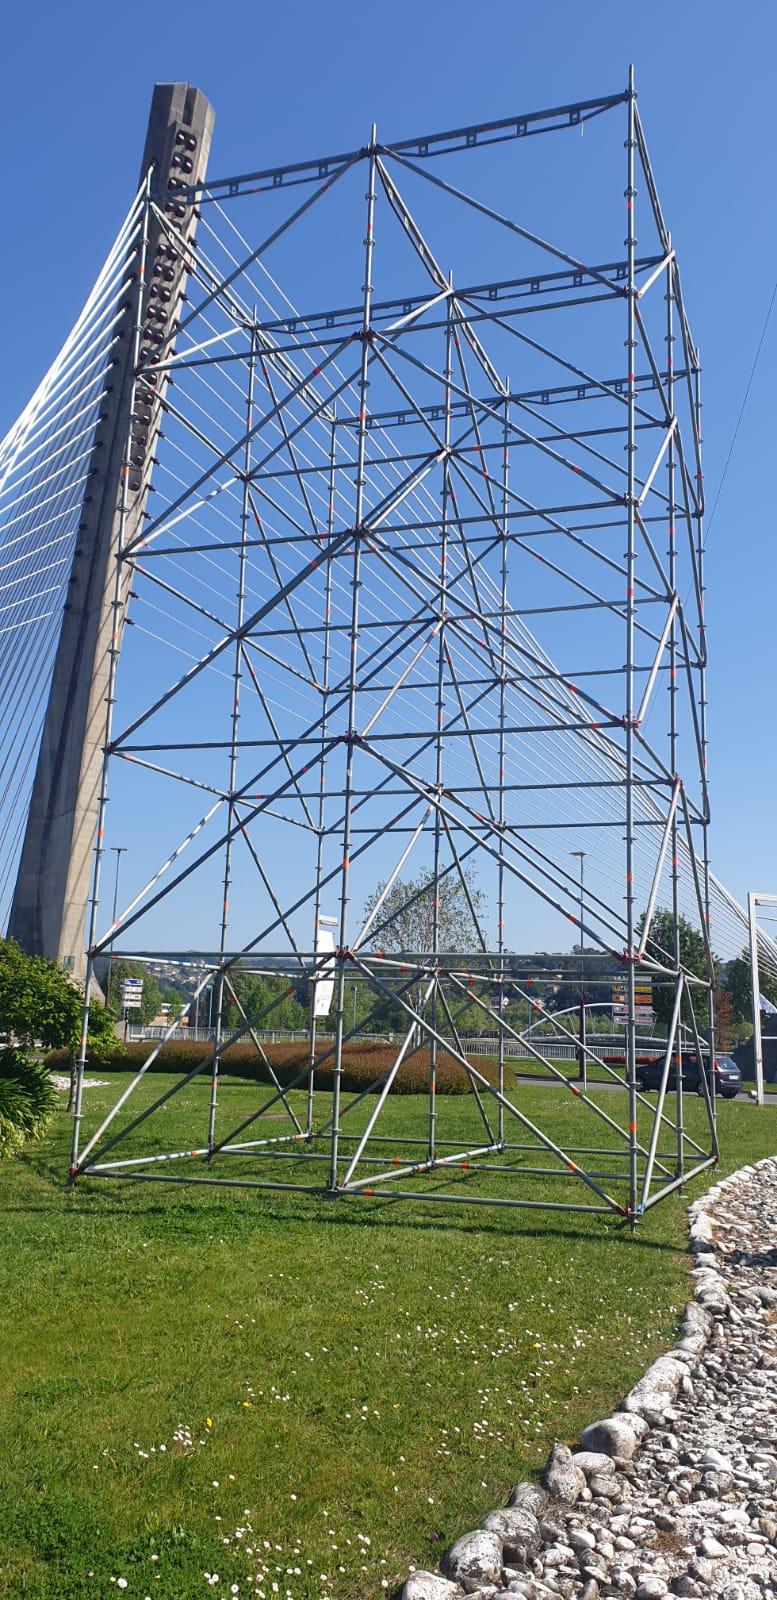 torres-triatlon-pontevedra_2-2019